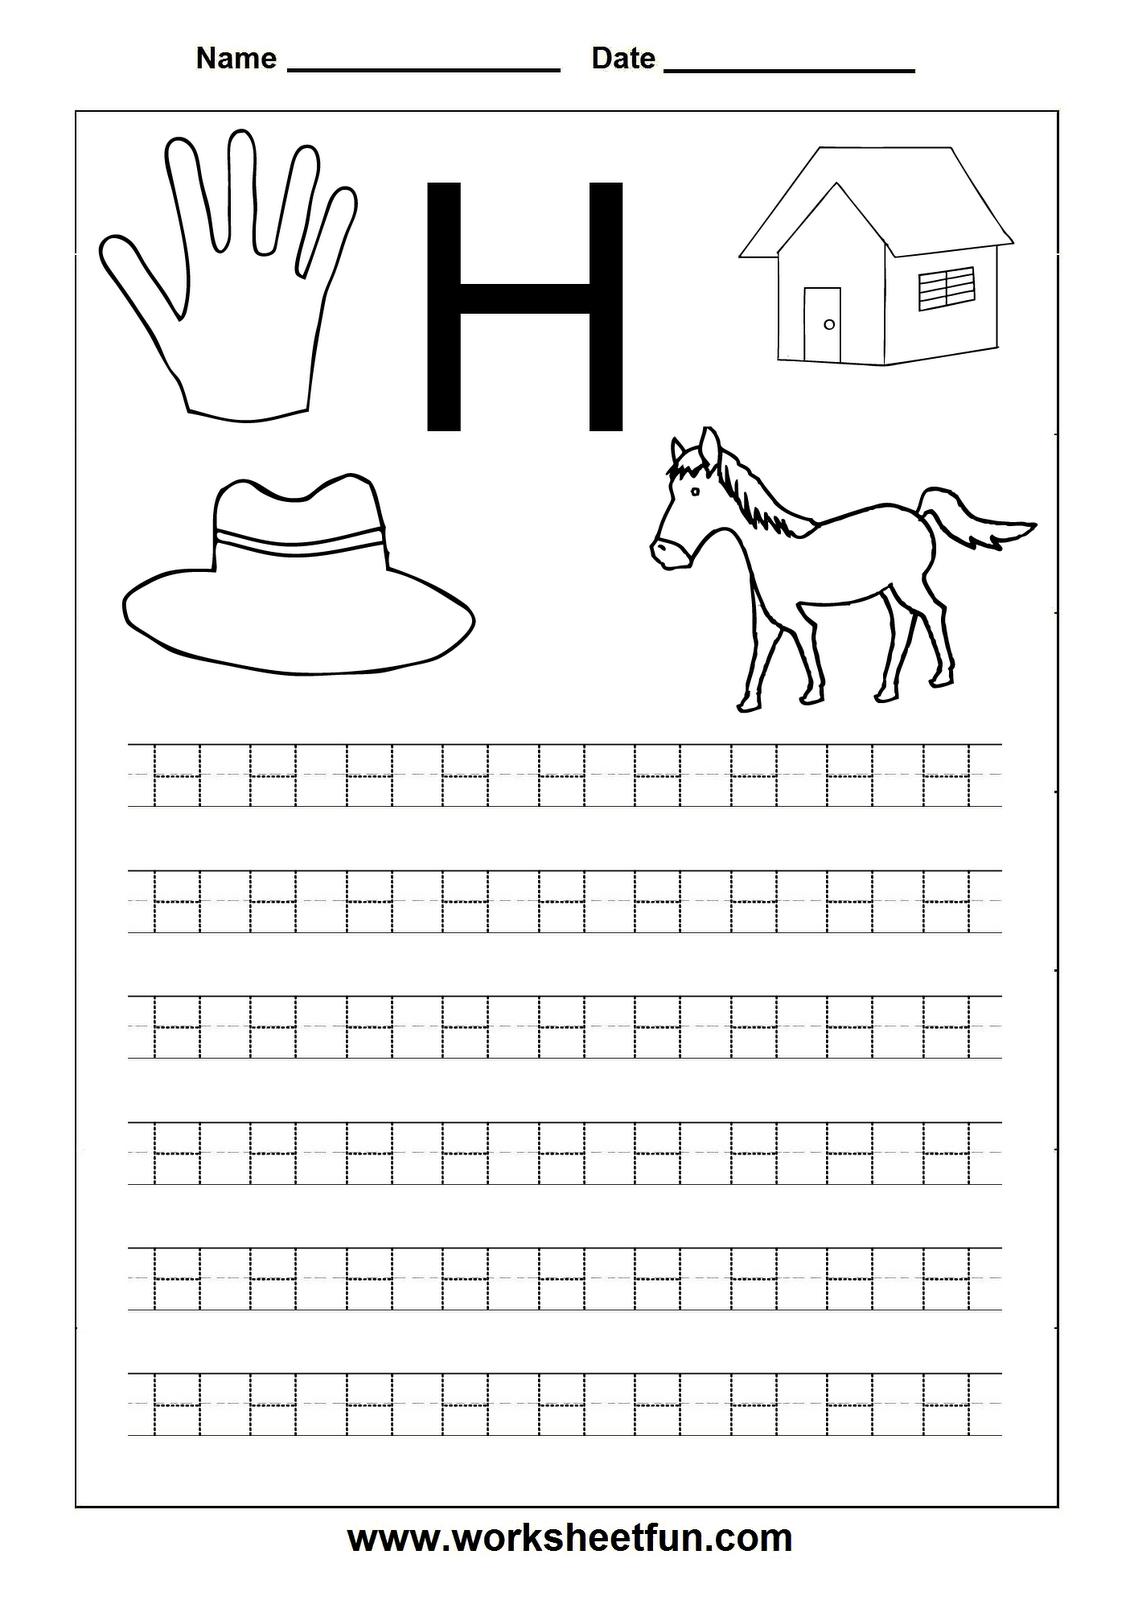 Worksheetfun Free Printable Worksheets Letter Tracing Worksheets Tracing Letters Tracing Worksheets [ 1600 x 1130 Pixel ]